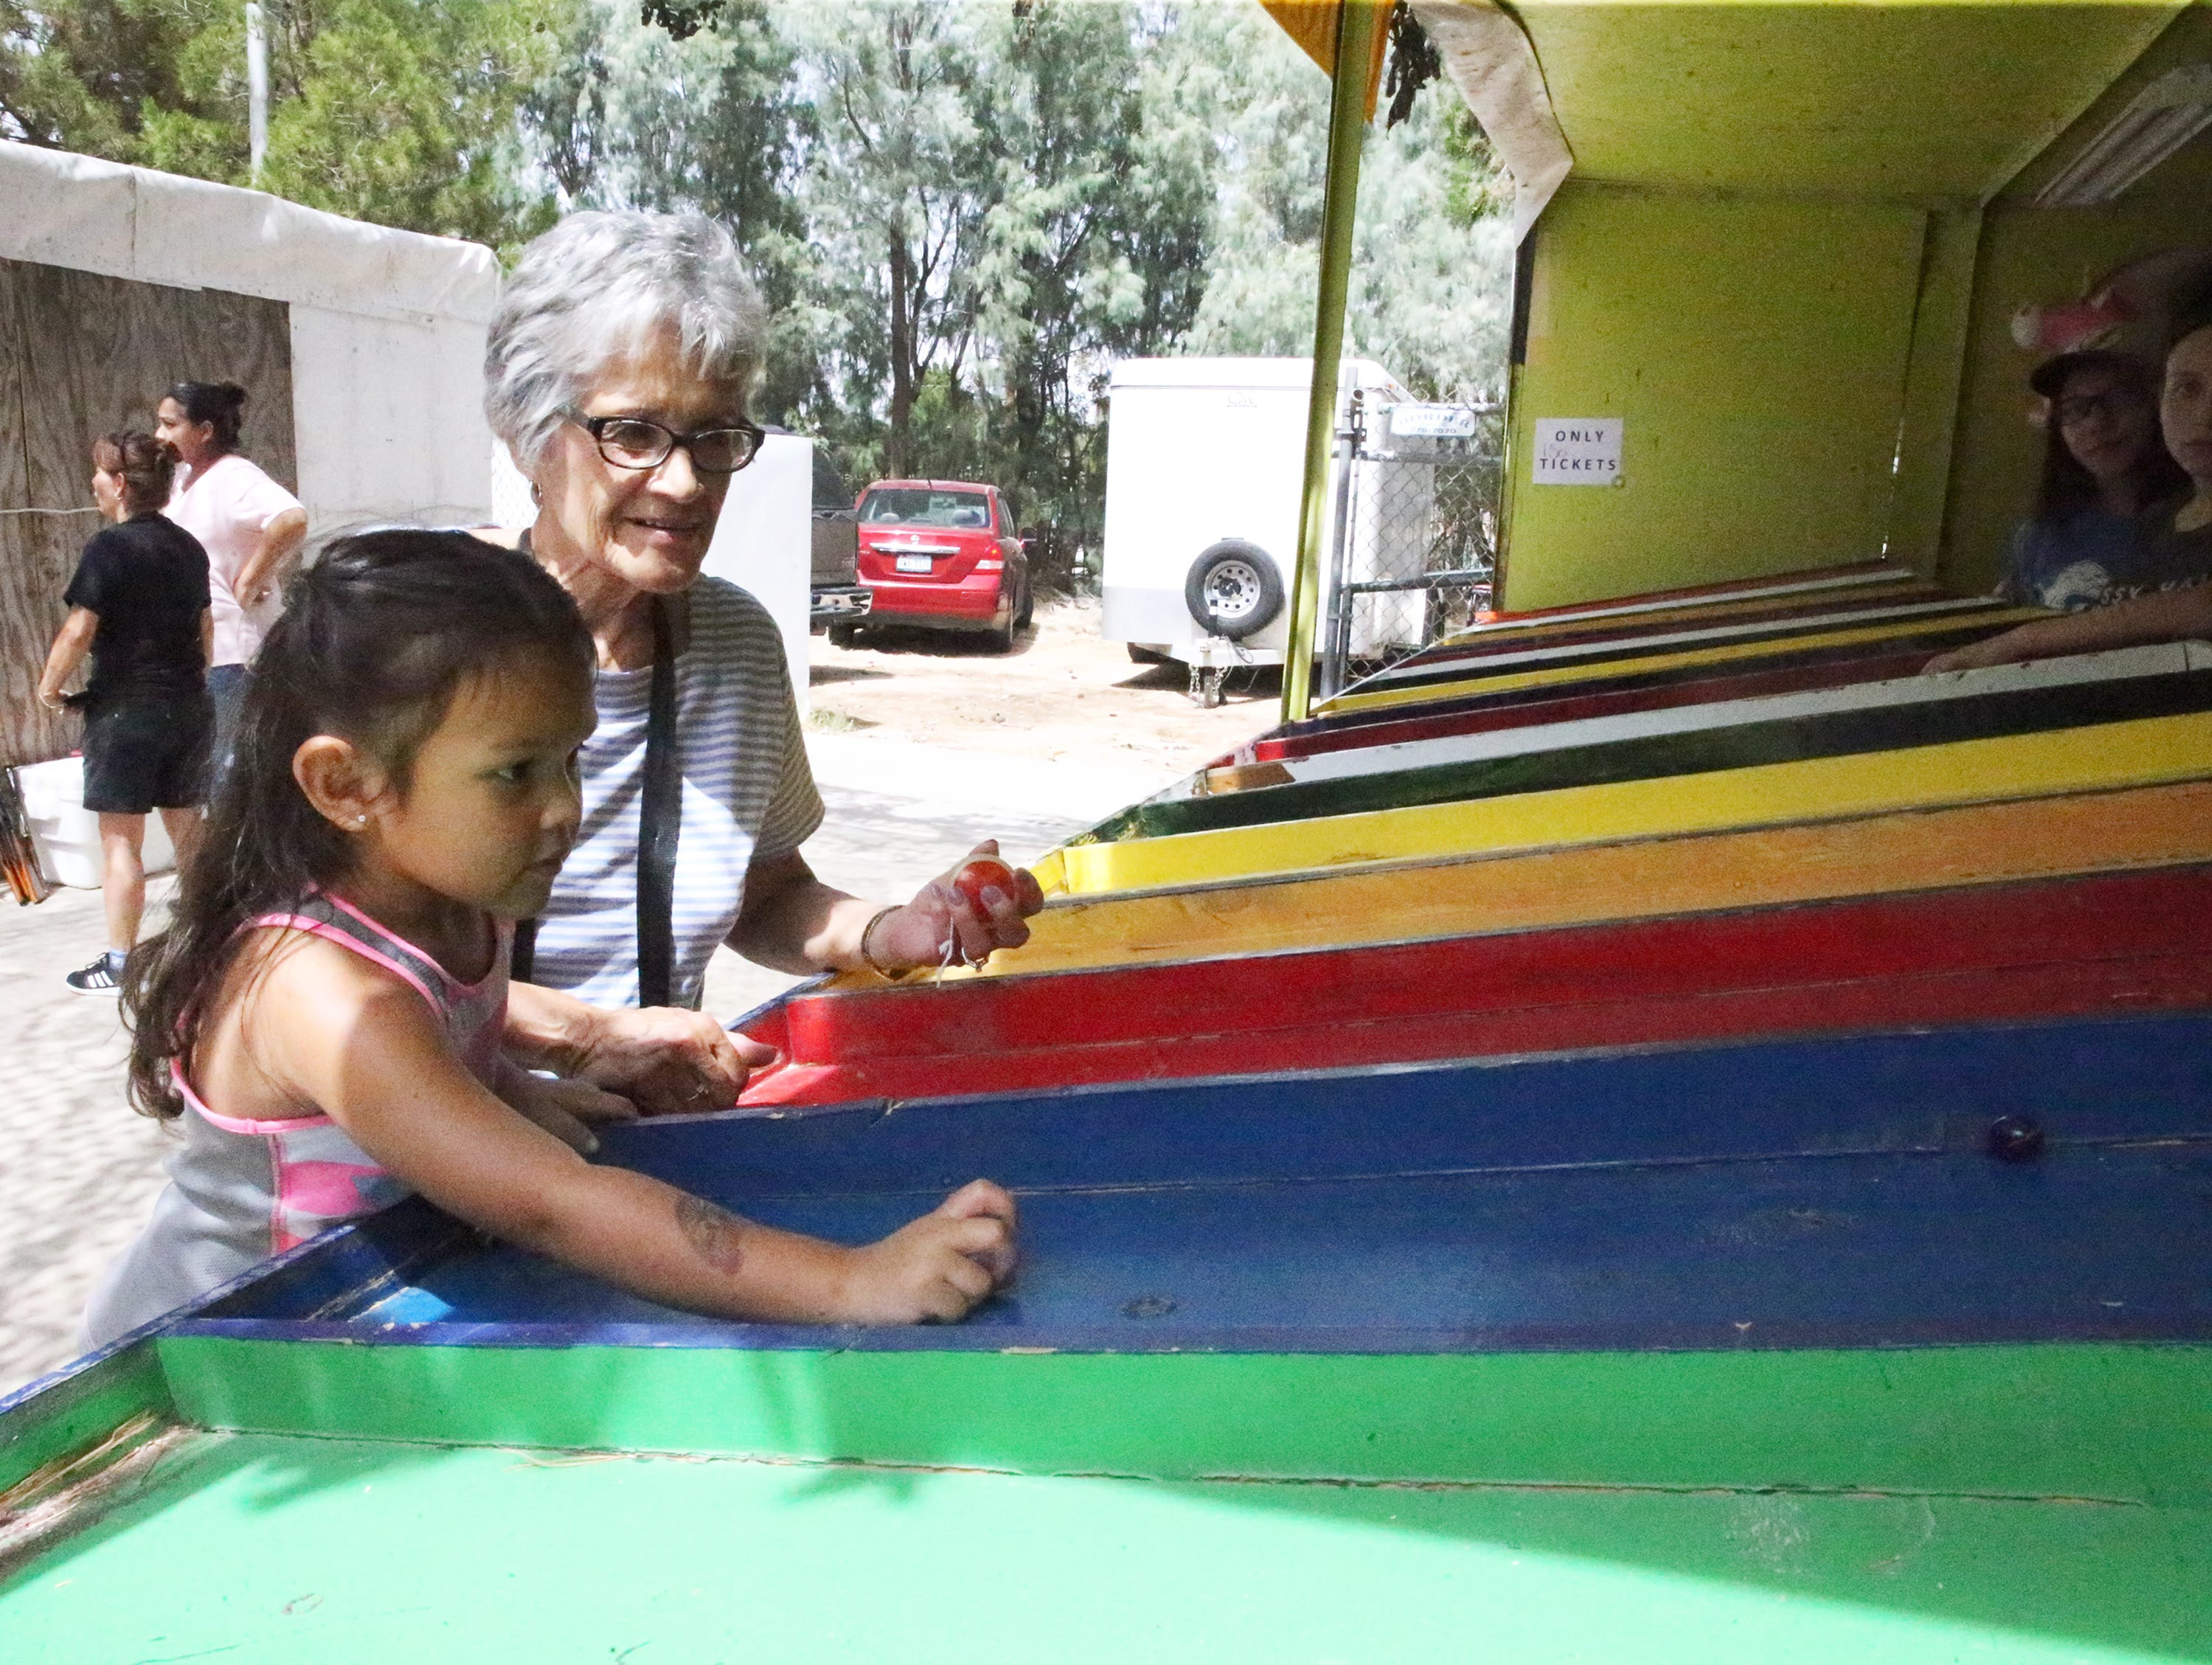 Camila Olivas, 4, tries her hand at marbles with grandmother Elia Olivas Saturday.